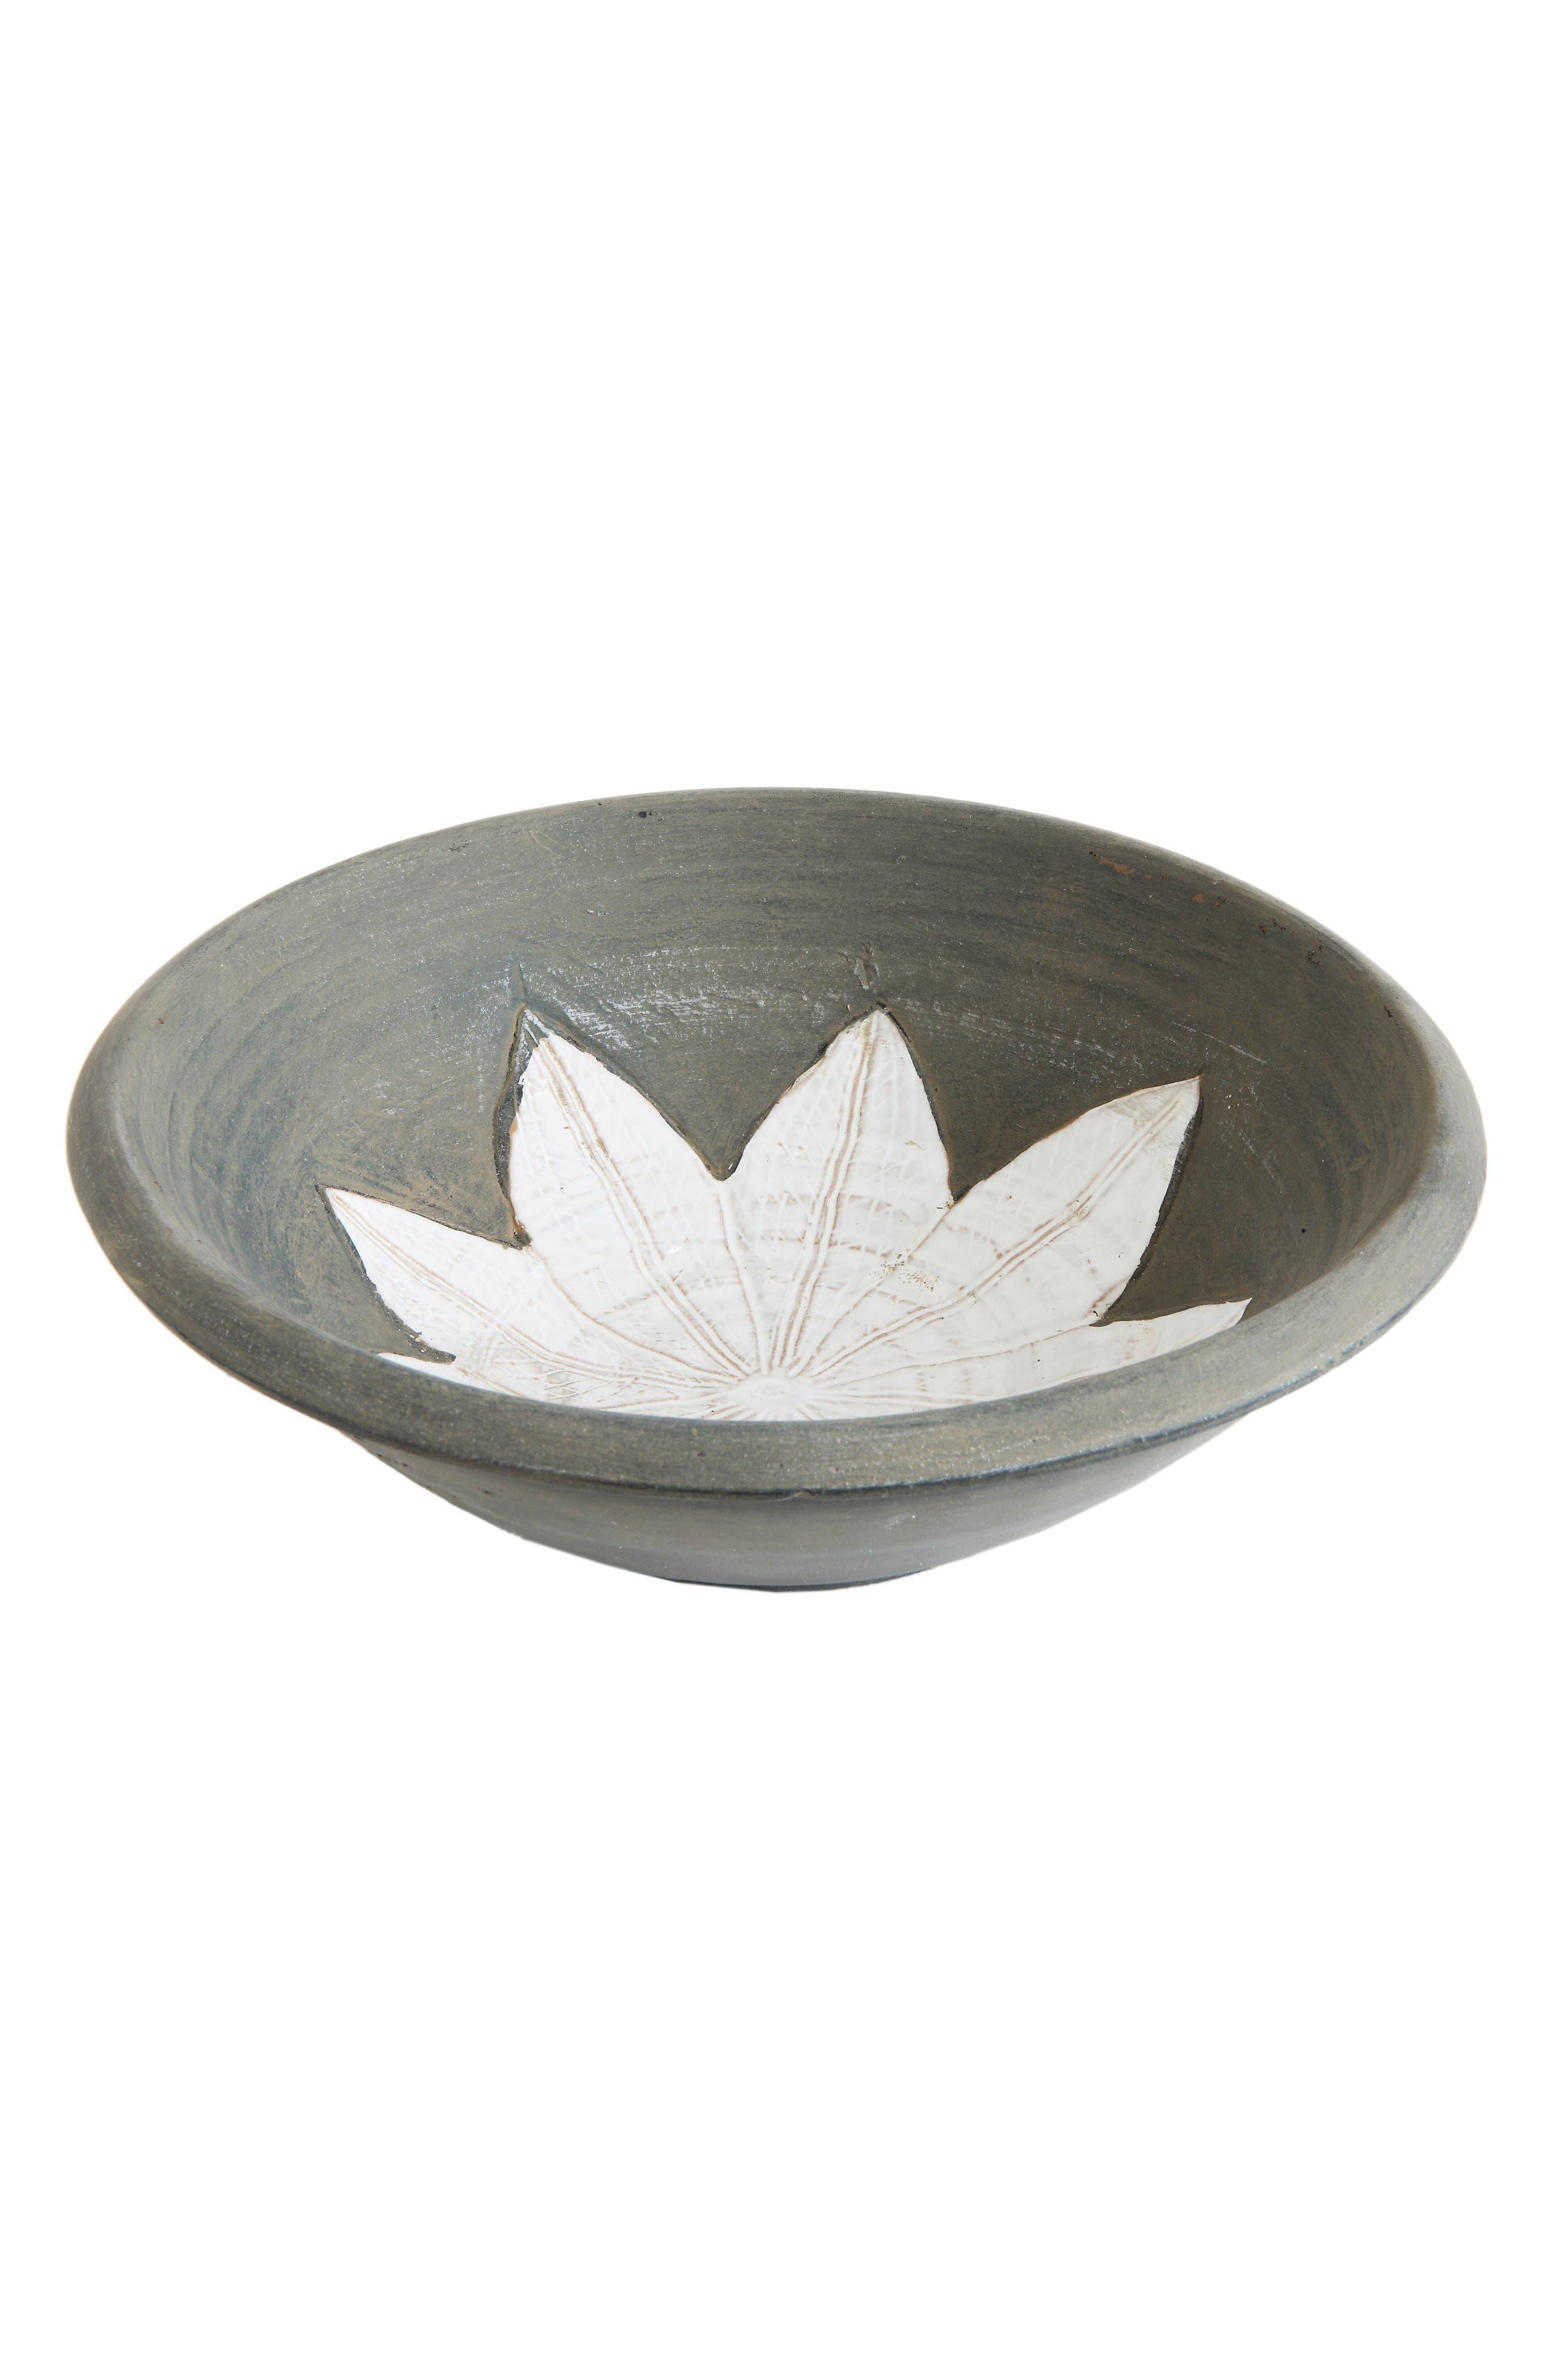 Terra Cotta Bowl,                             Main thumbnail 1, color,                             Grey